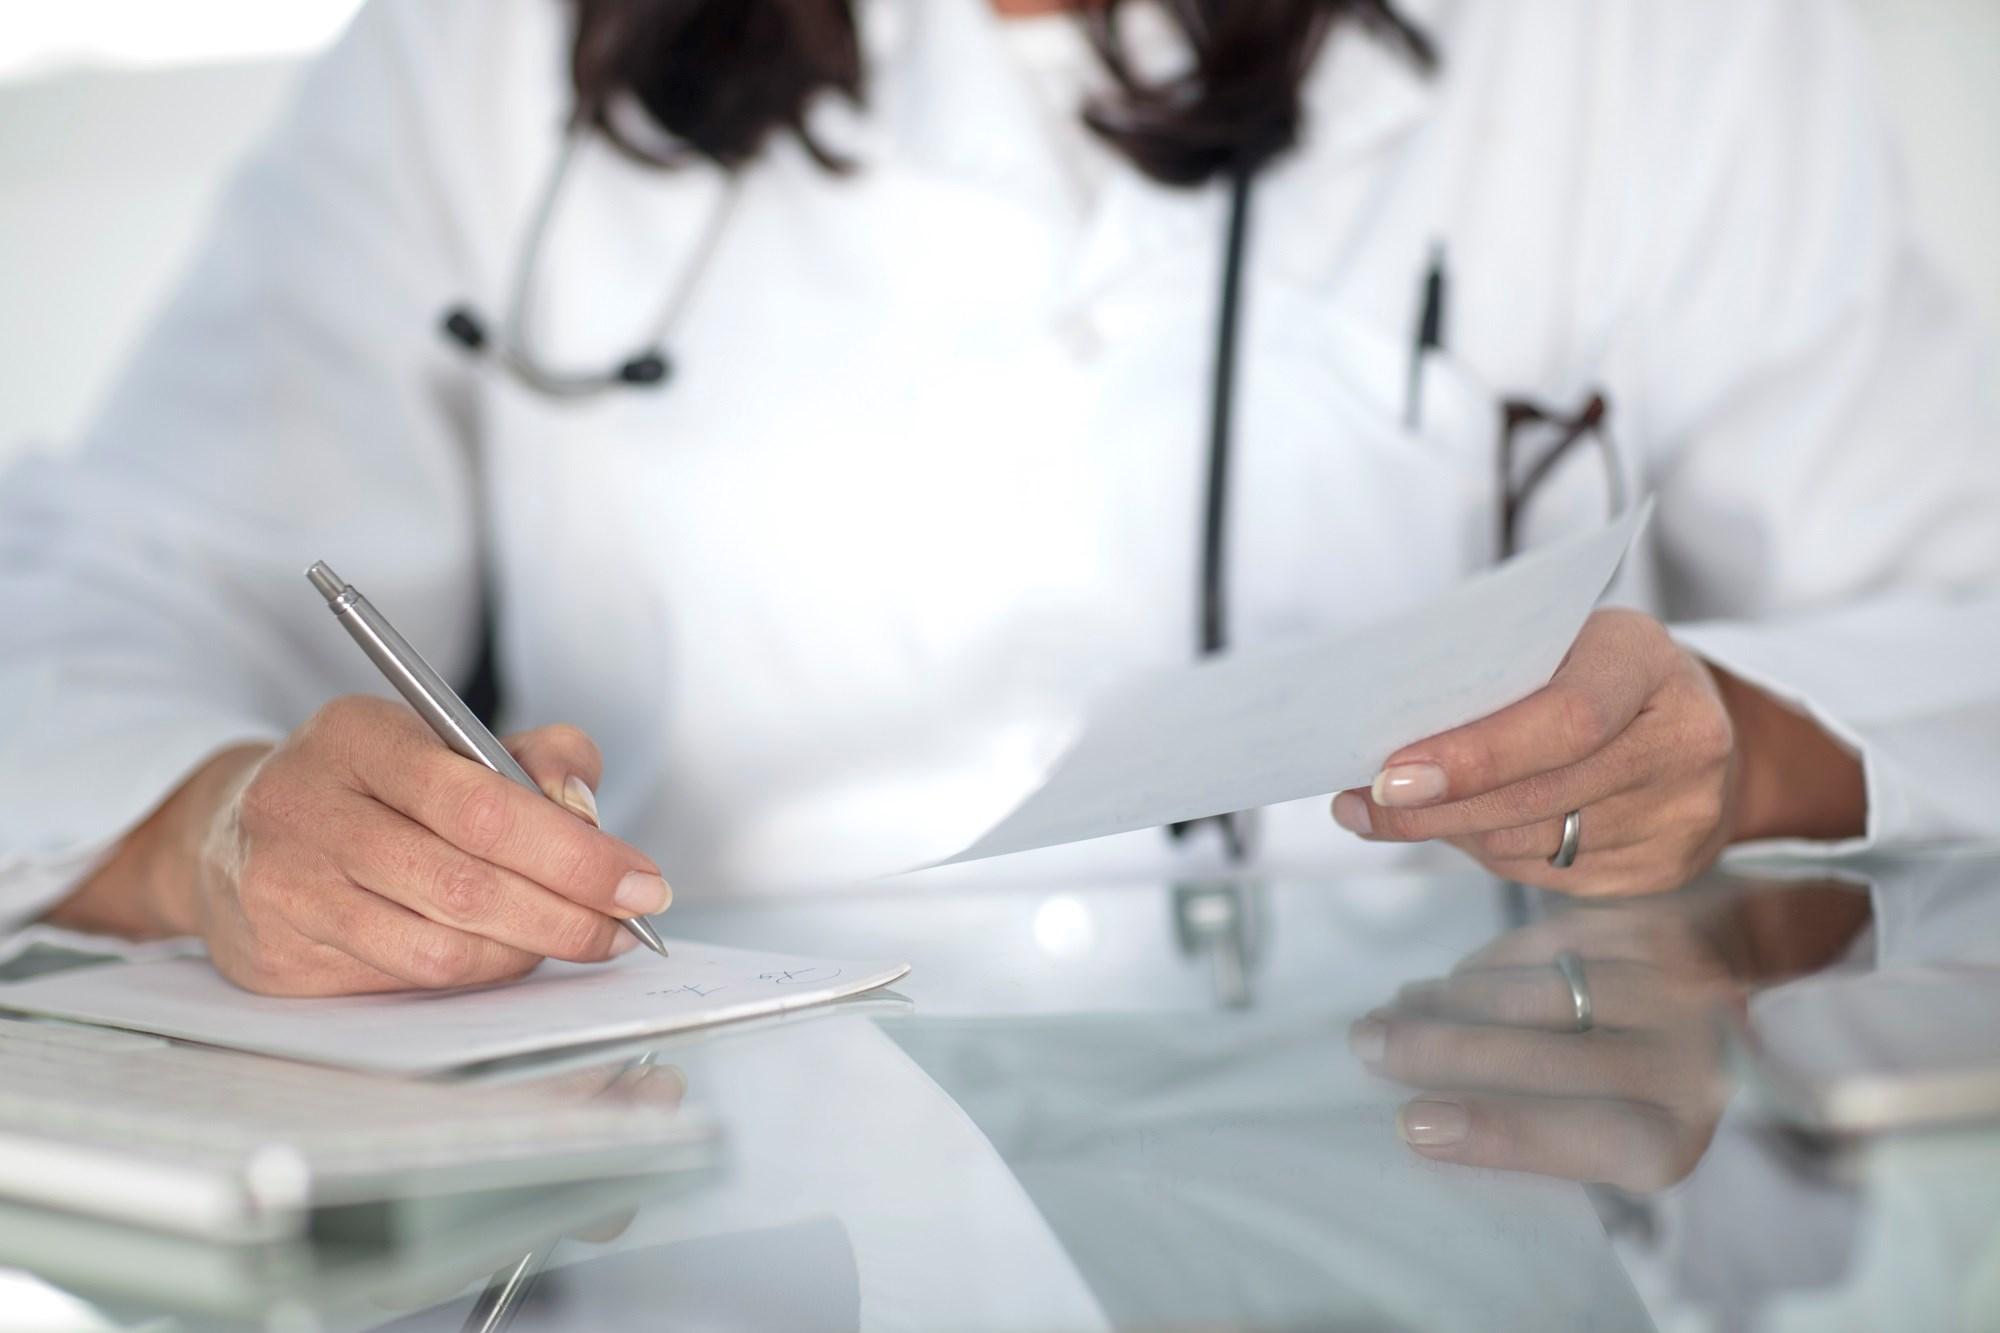 Quantity of Opioids Prescribed Postop Linked to Consumption